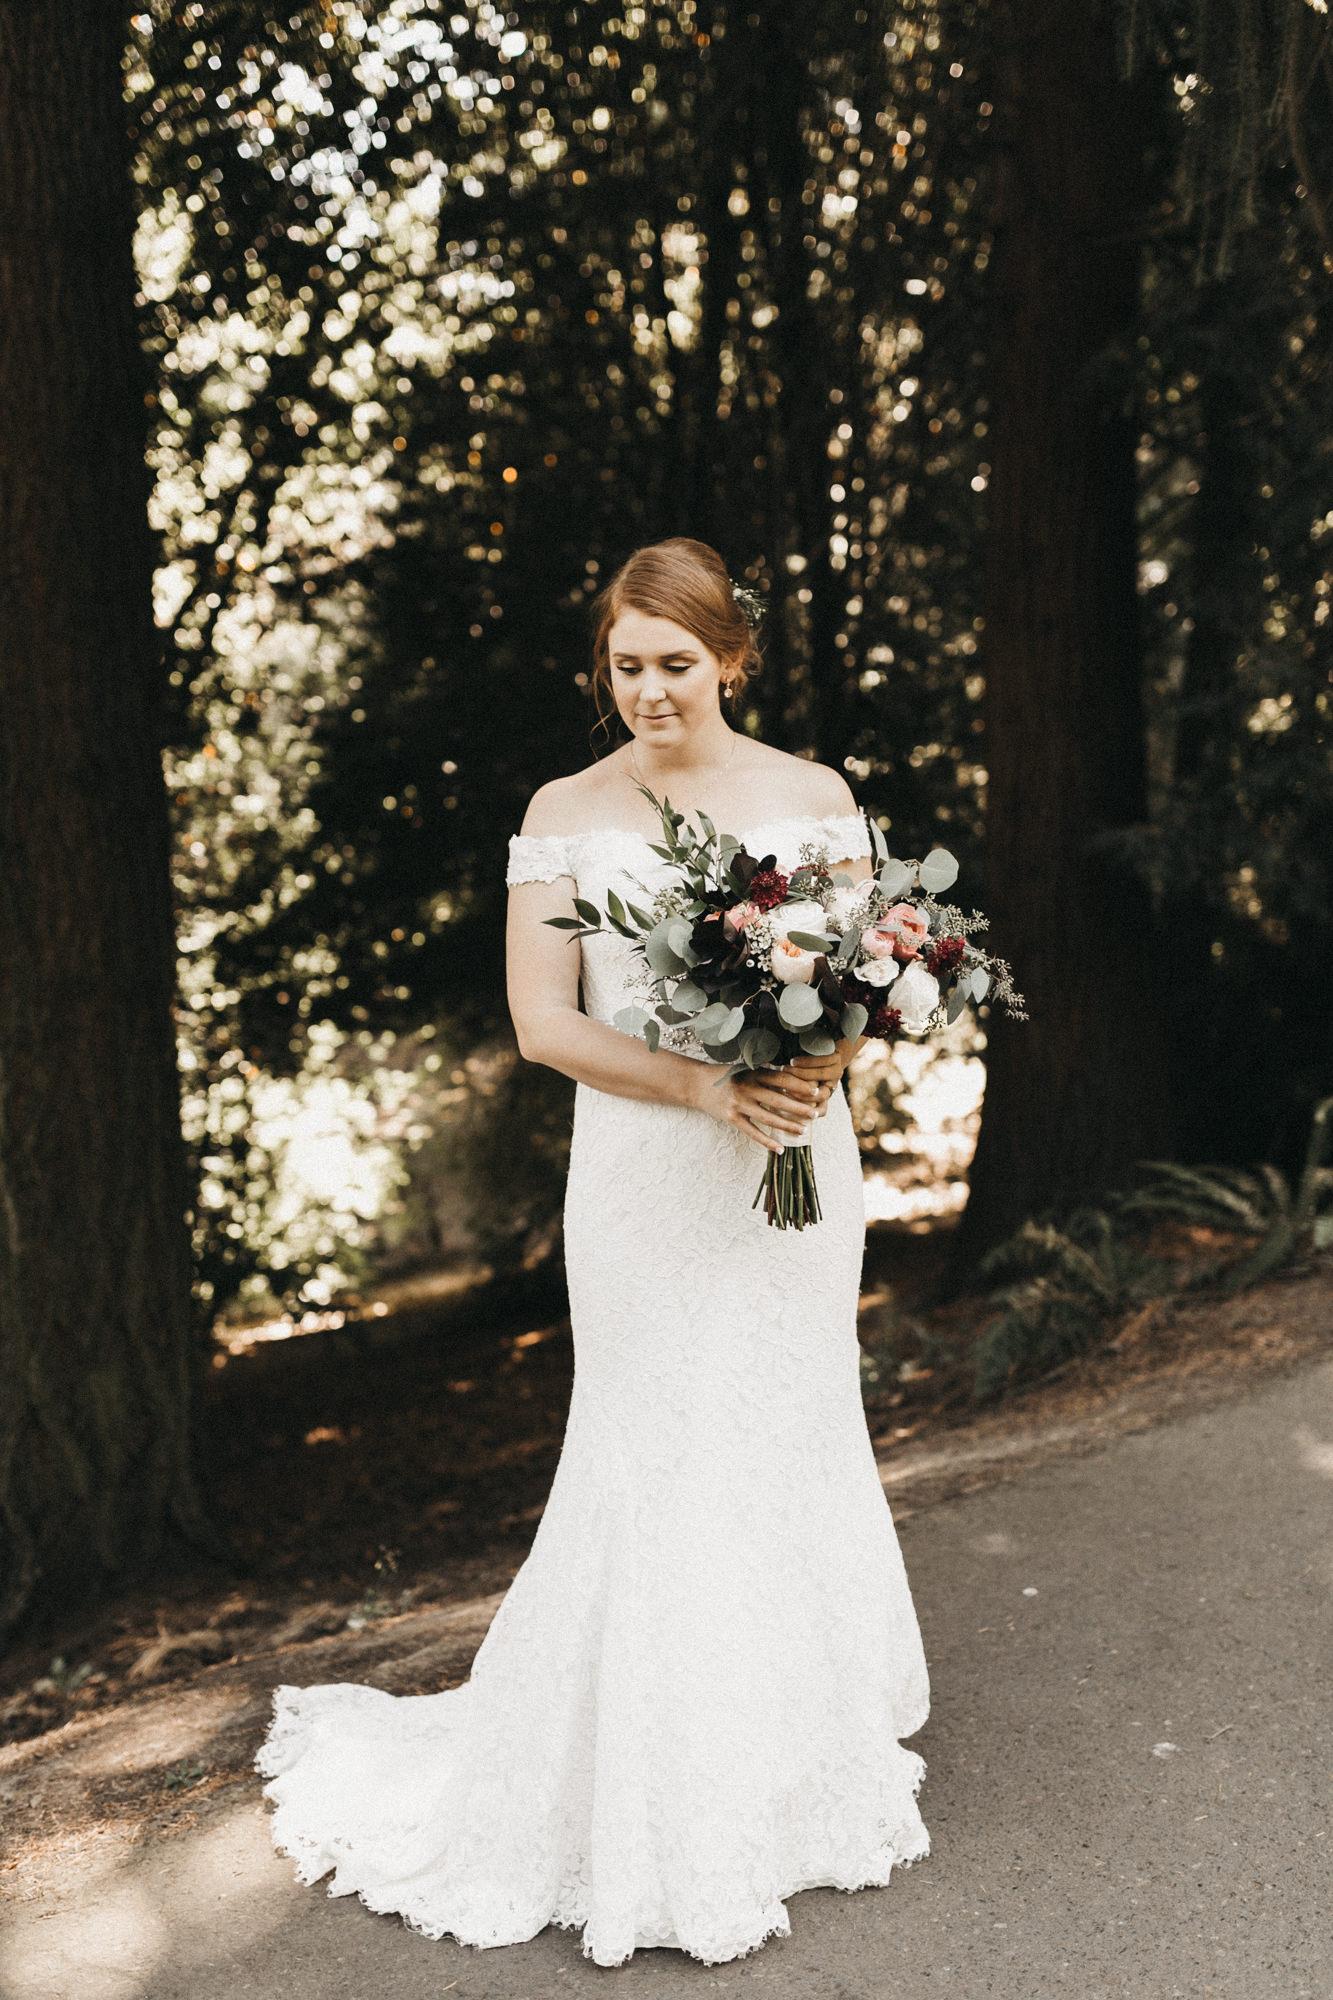 the_evergreen_portland_wedding-27.jpg